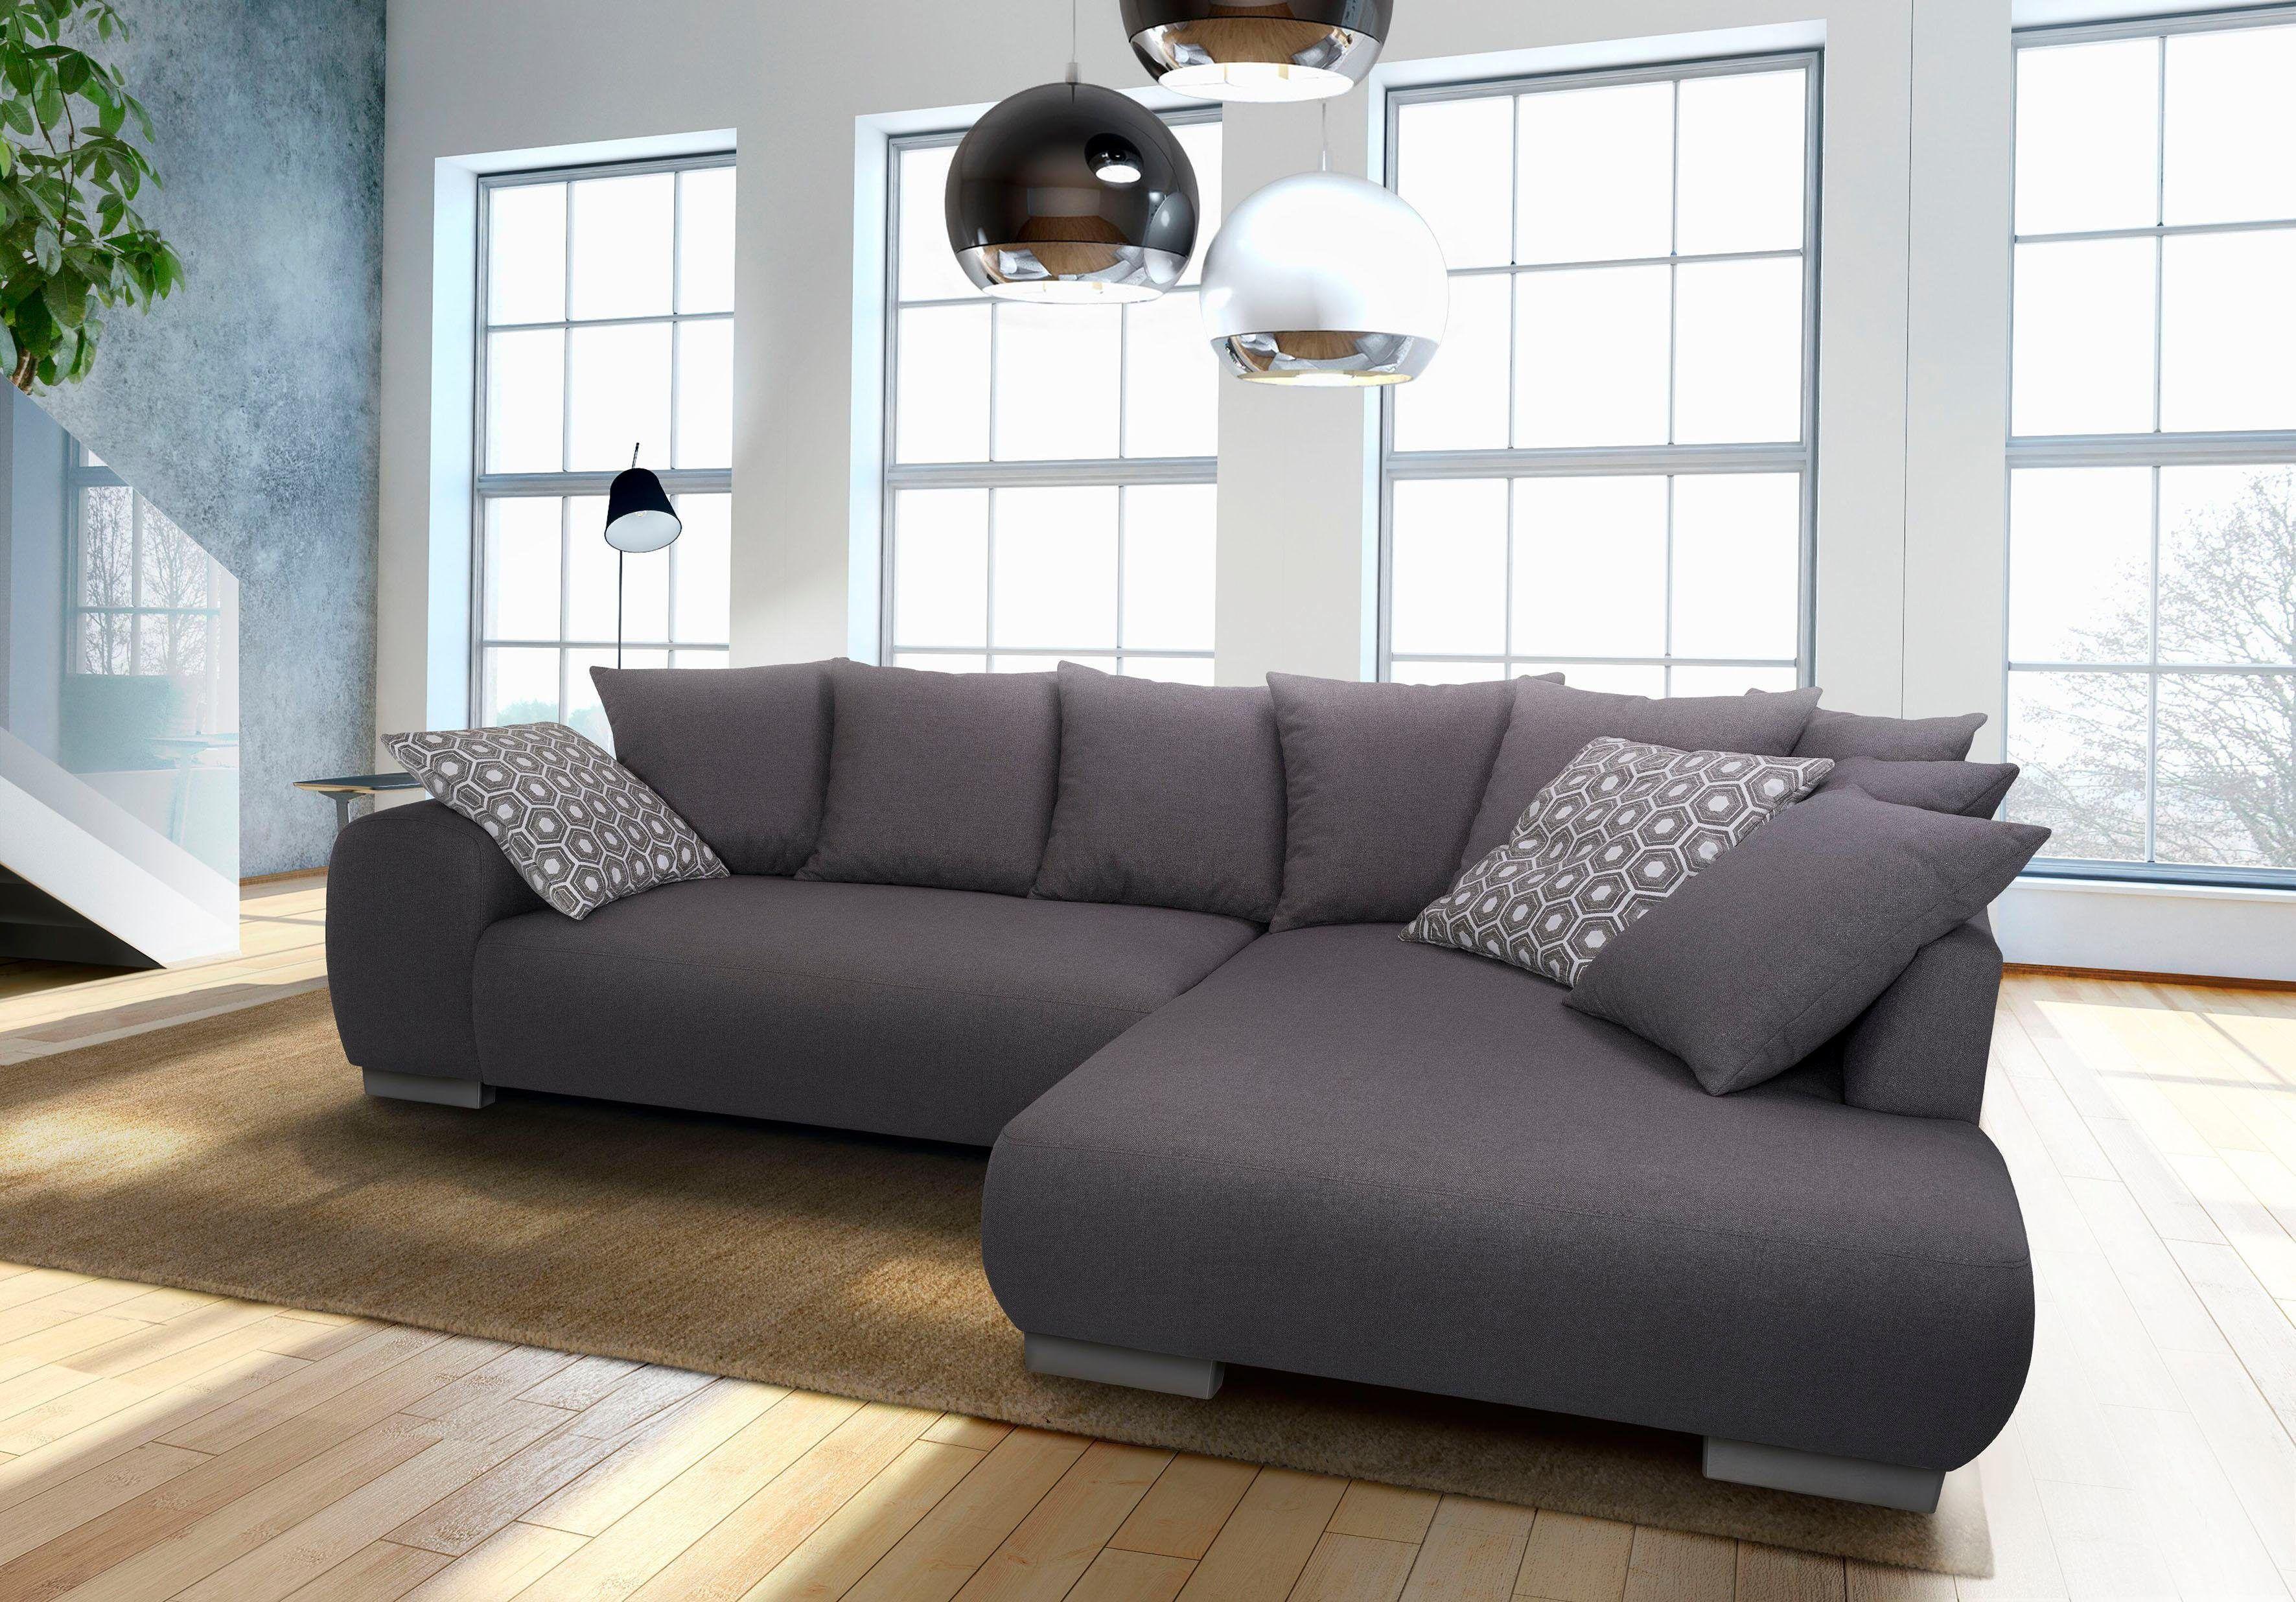 Luxus sofa Grau Weiß Design